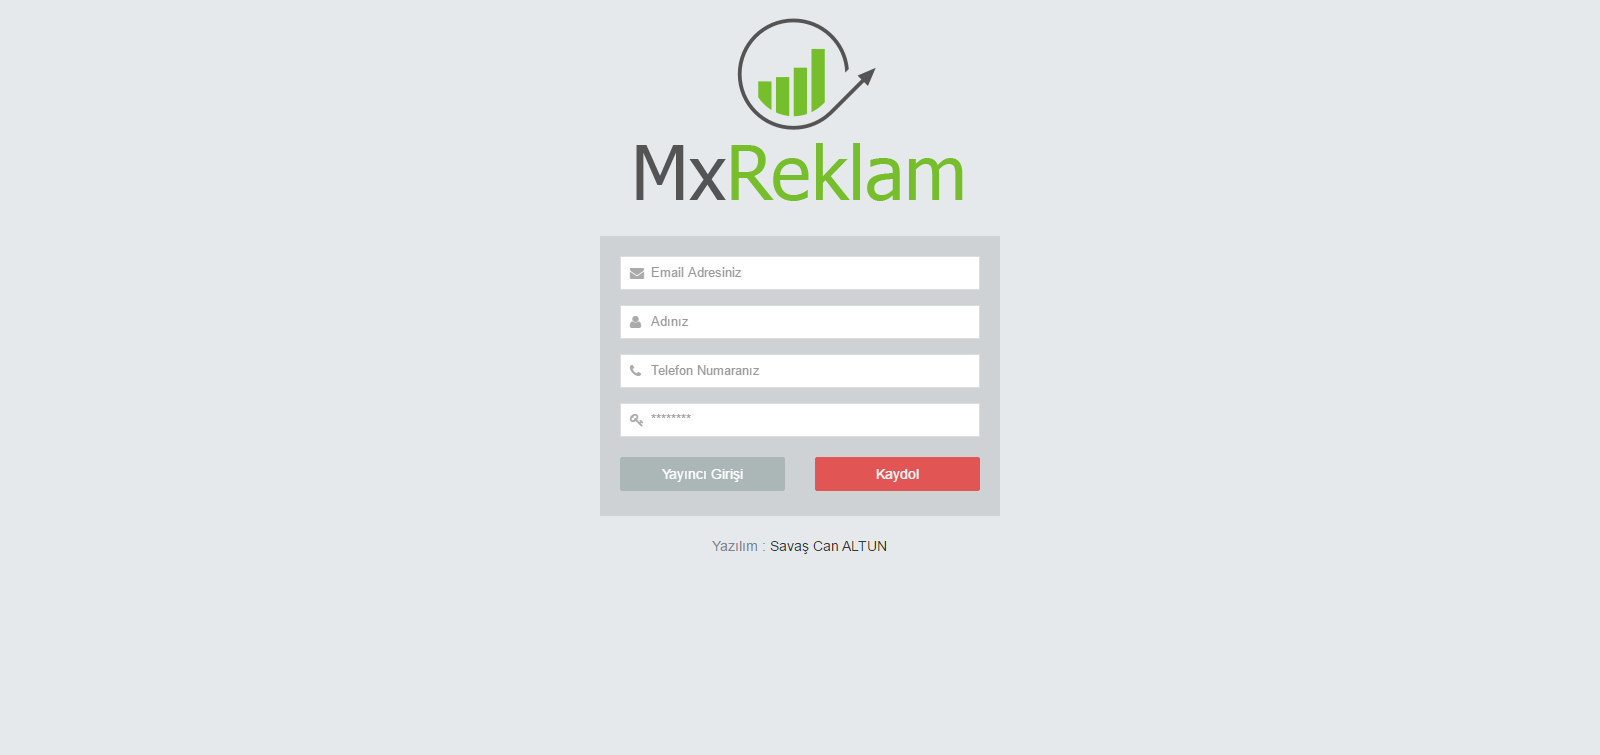 mxreklam-3